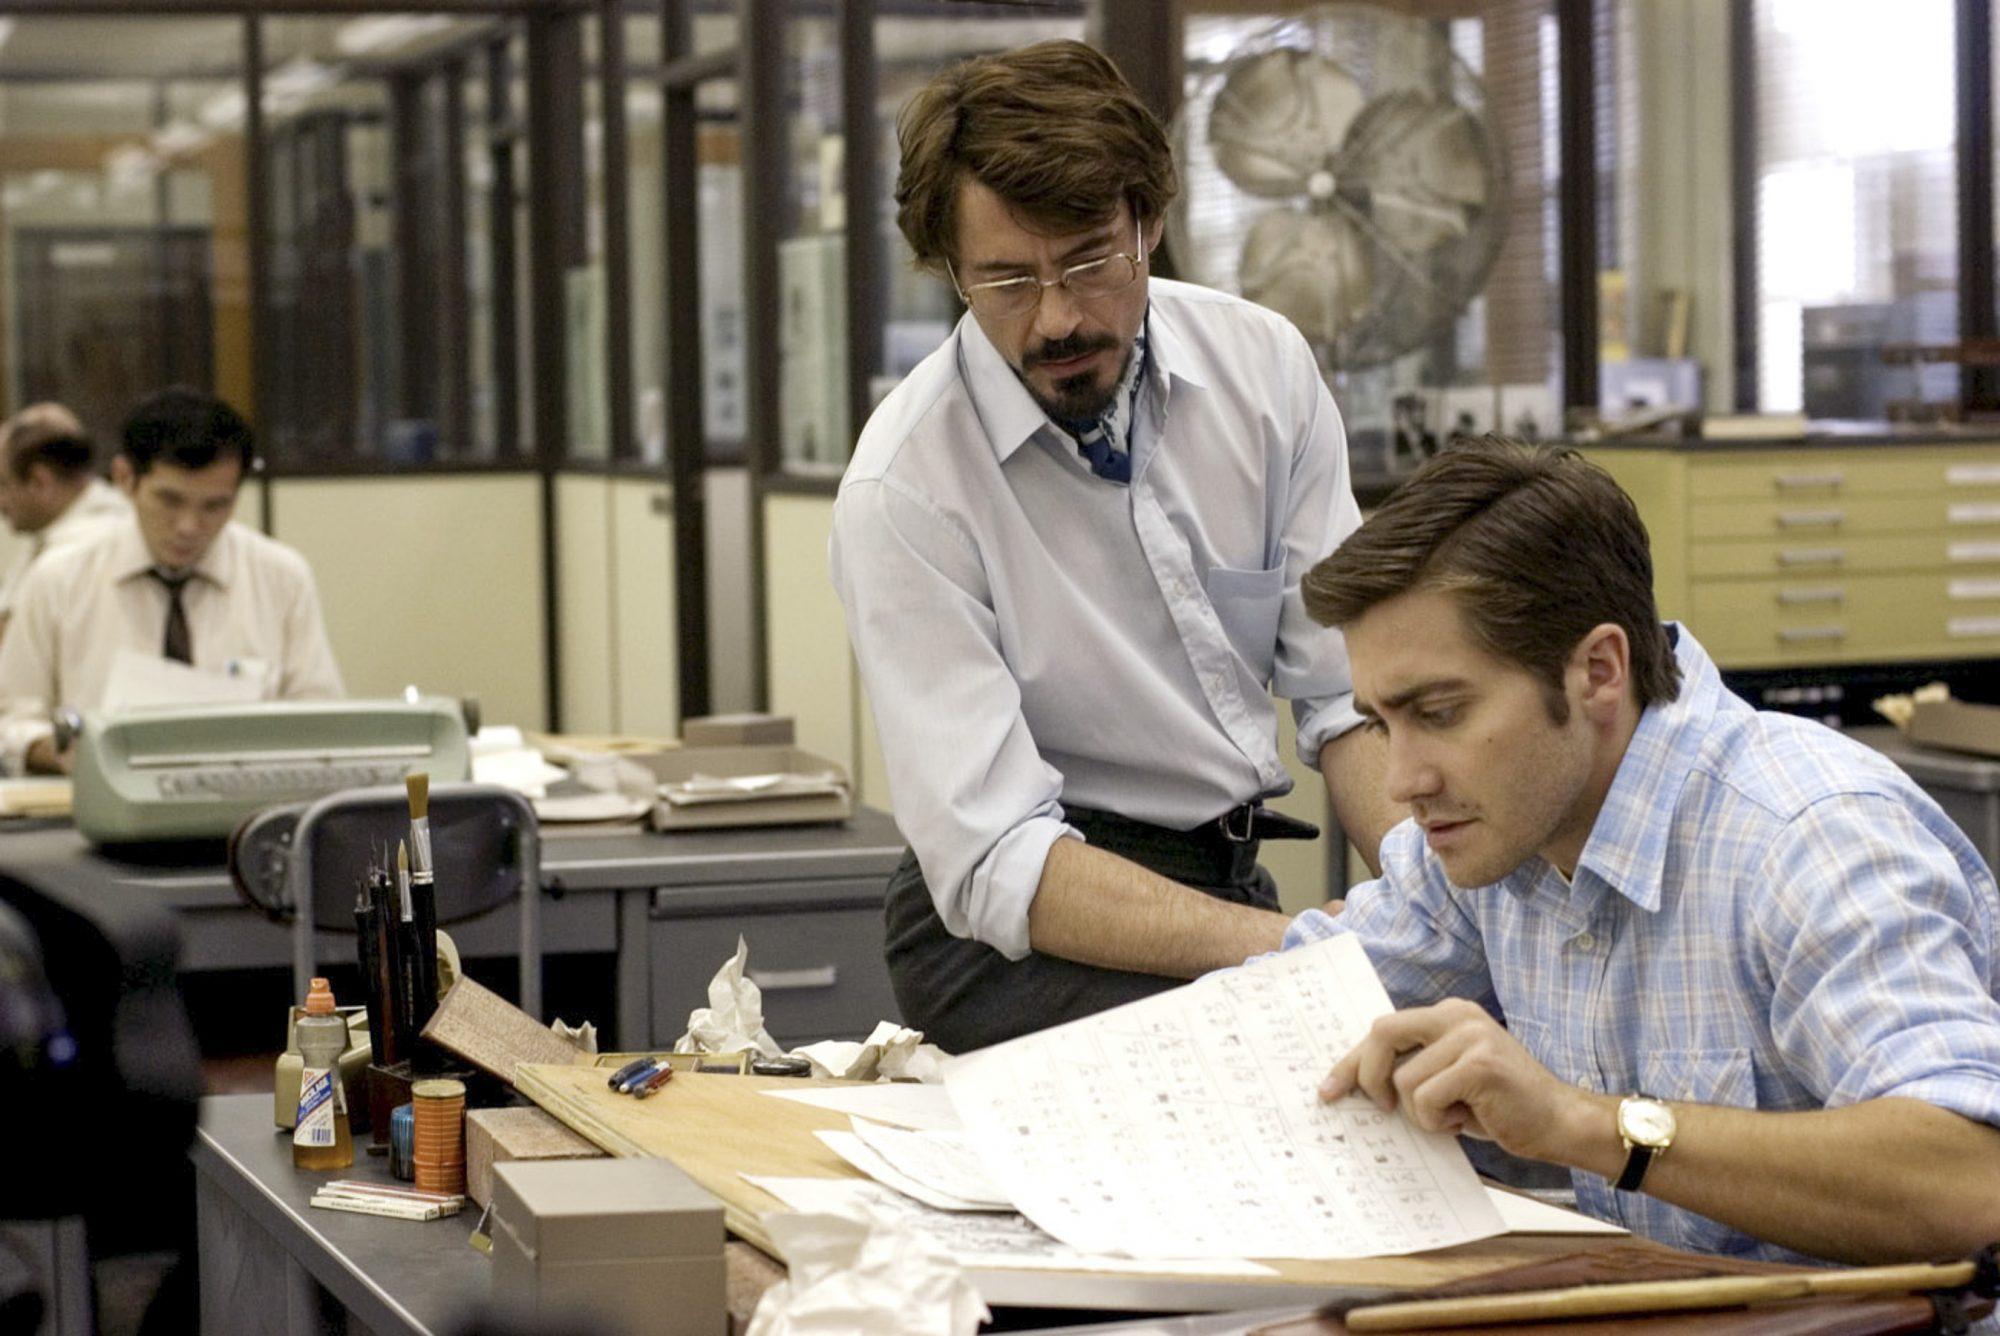 ZODIAC, Robert Downey Jr., Jake Gyllenhaal, 2007. ©Paramount/courtesy Everett Collection